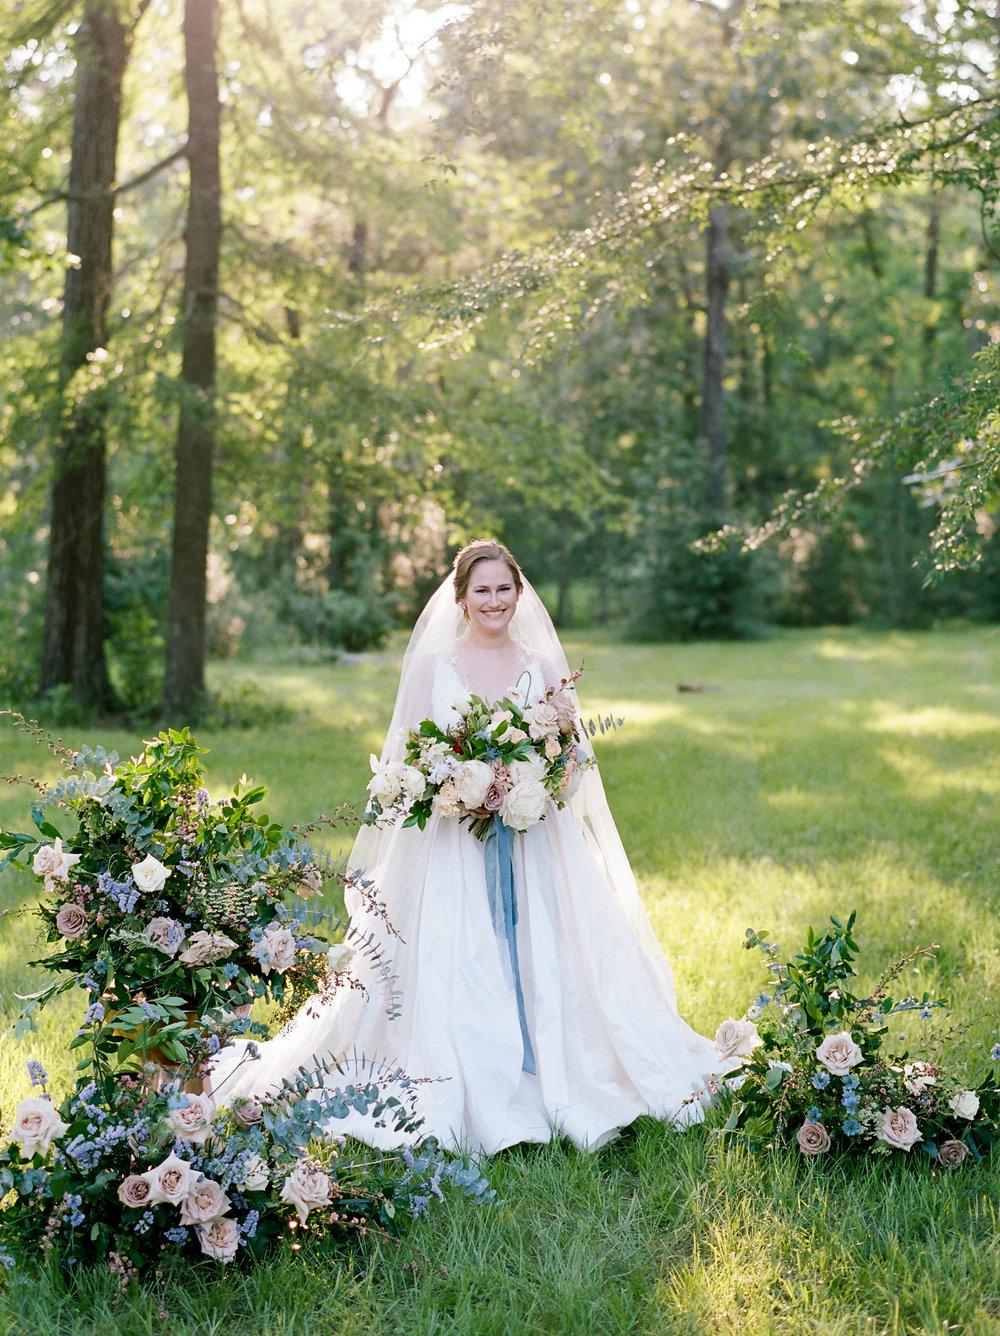 Houston-Fine-Art-Film-Destination-Wedding-Photographer-Top-Best-Luxury-Josh-Dana-Fernandez-Photographer-Austin-Texas-18.jpg